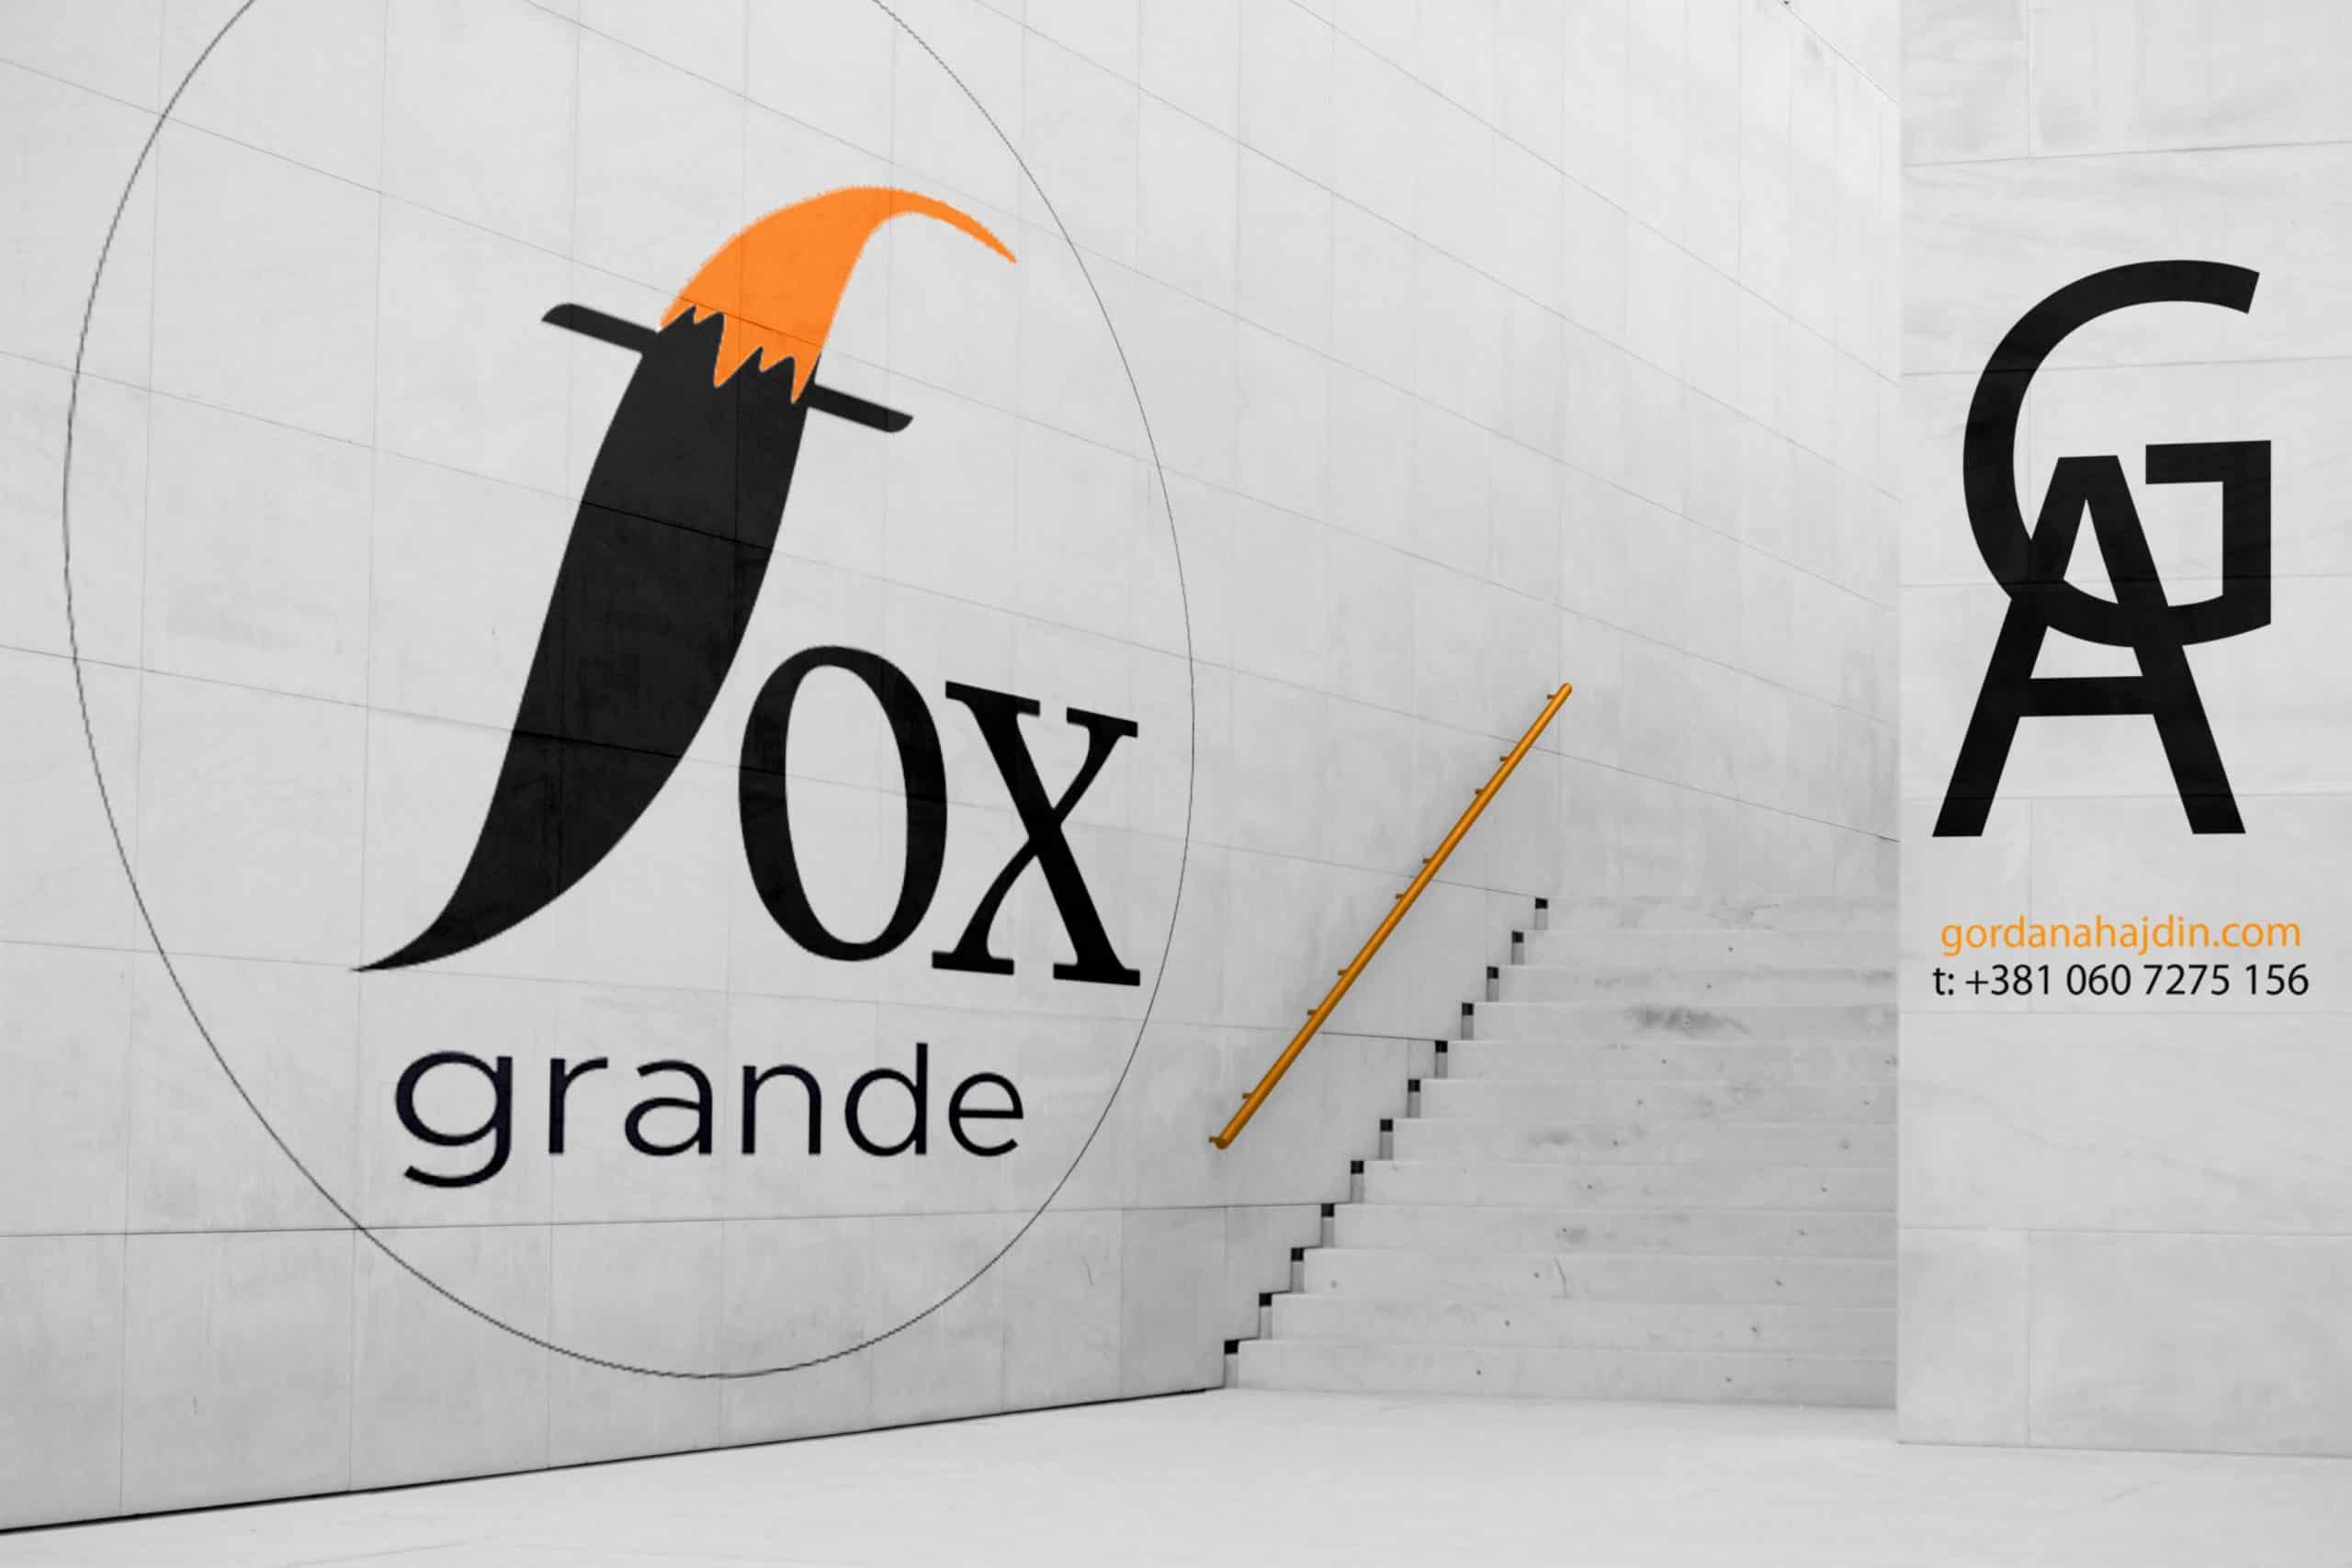 reklama fox na zidu